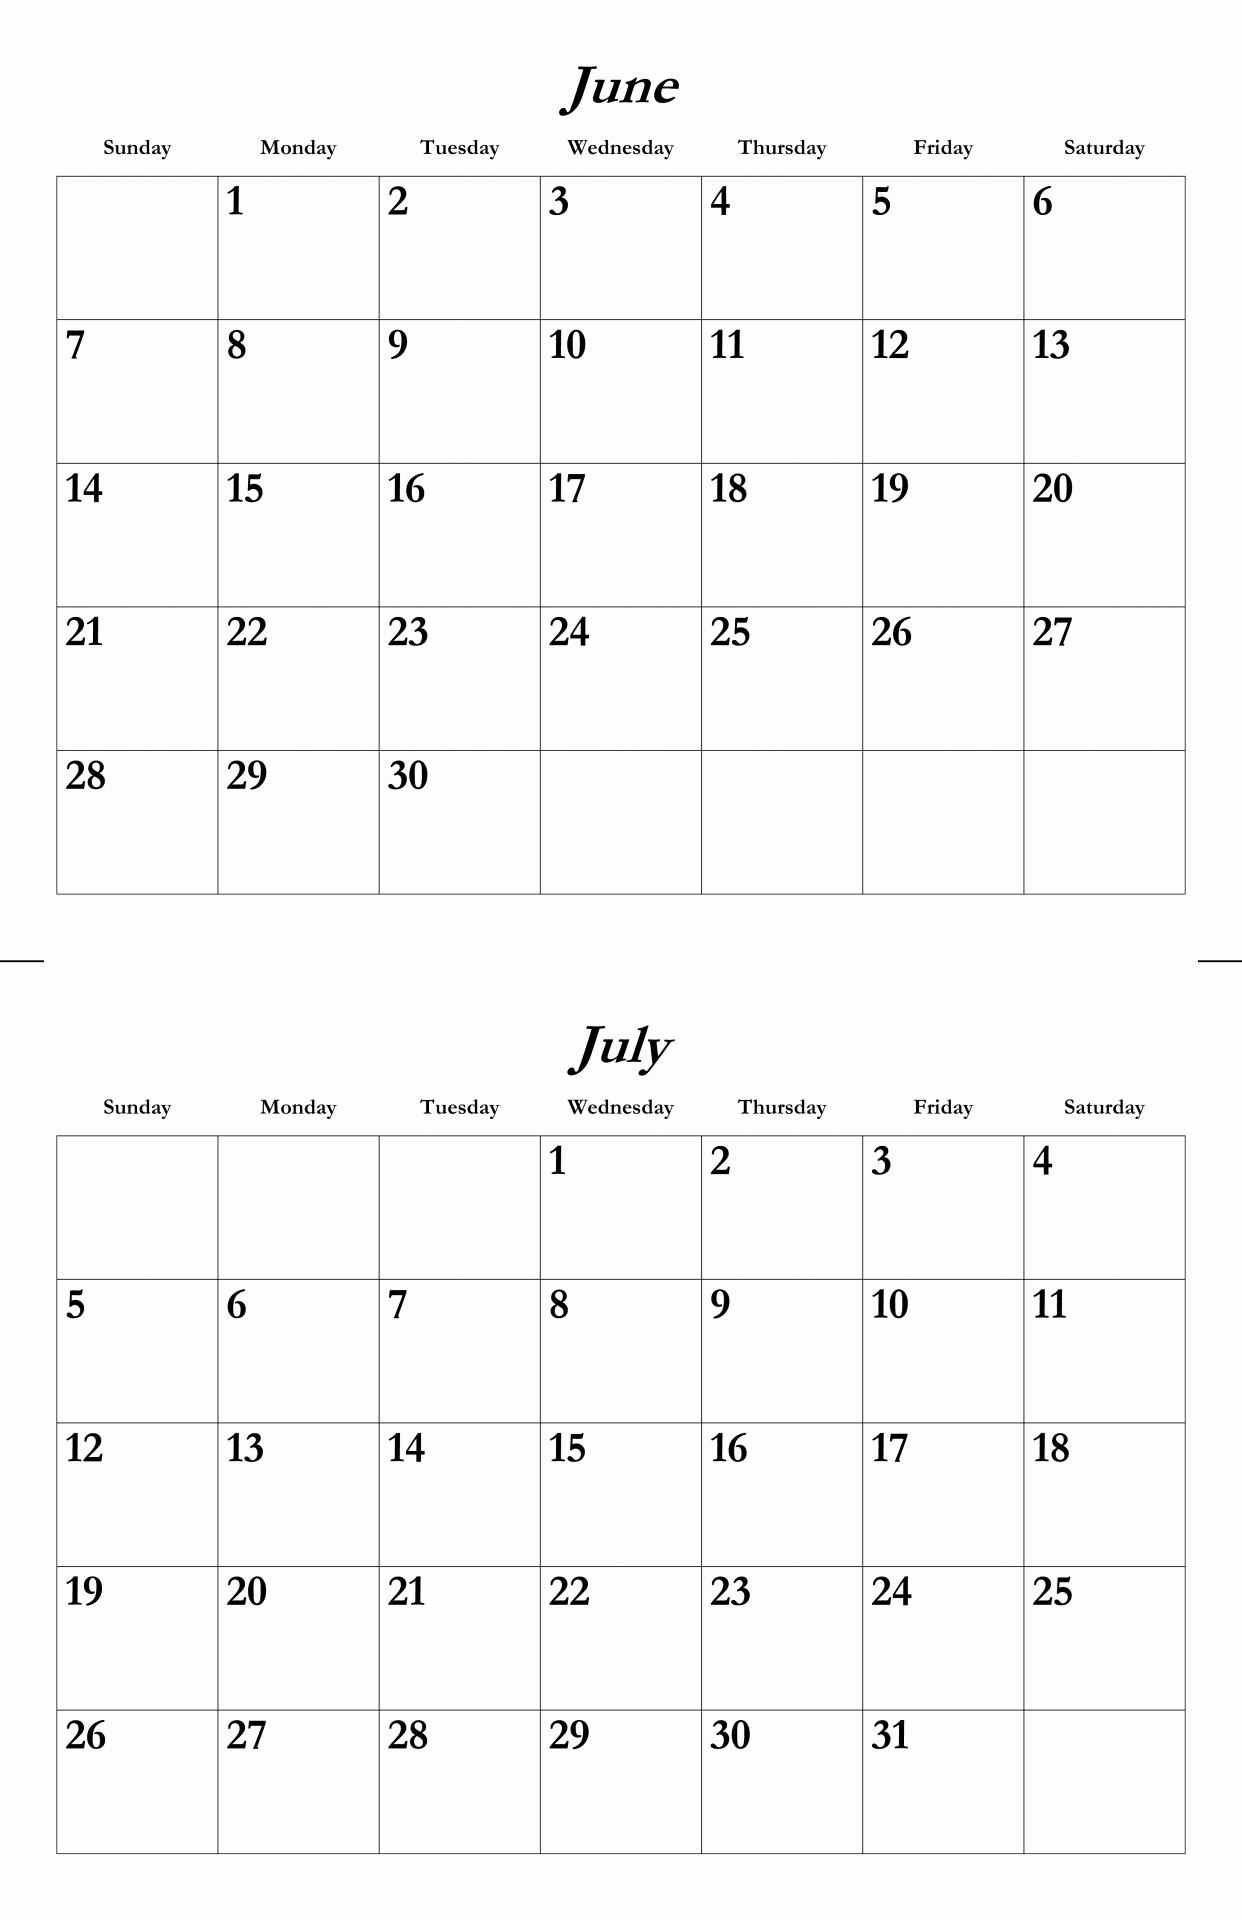 Calendar Template for June 2015 Inspirational June July 2015 Calendar Template Free Stock Public